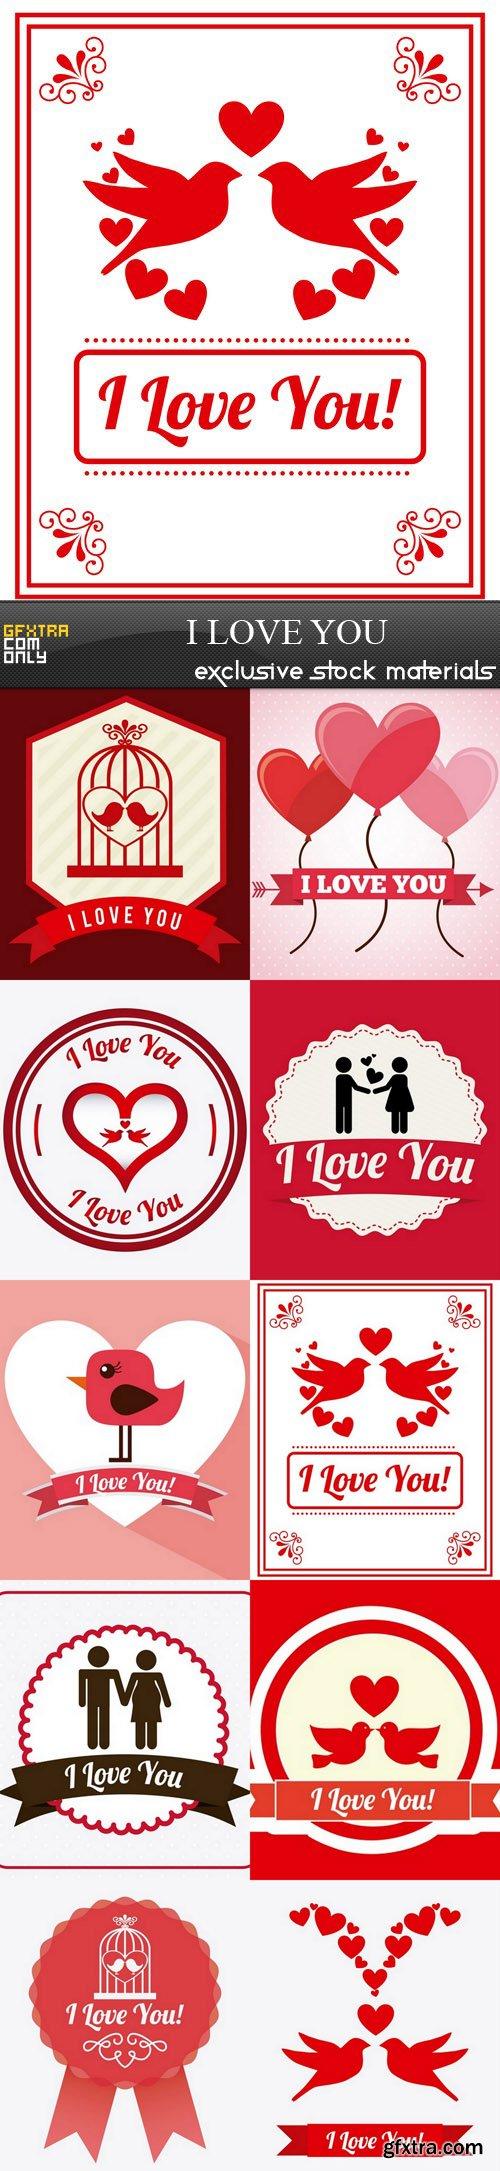 I Love You - 10xEPS